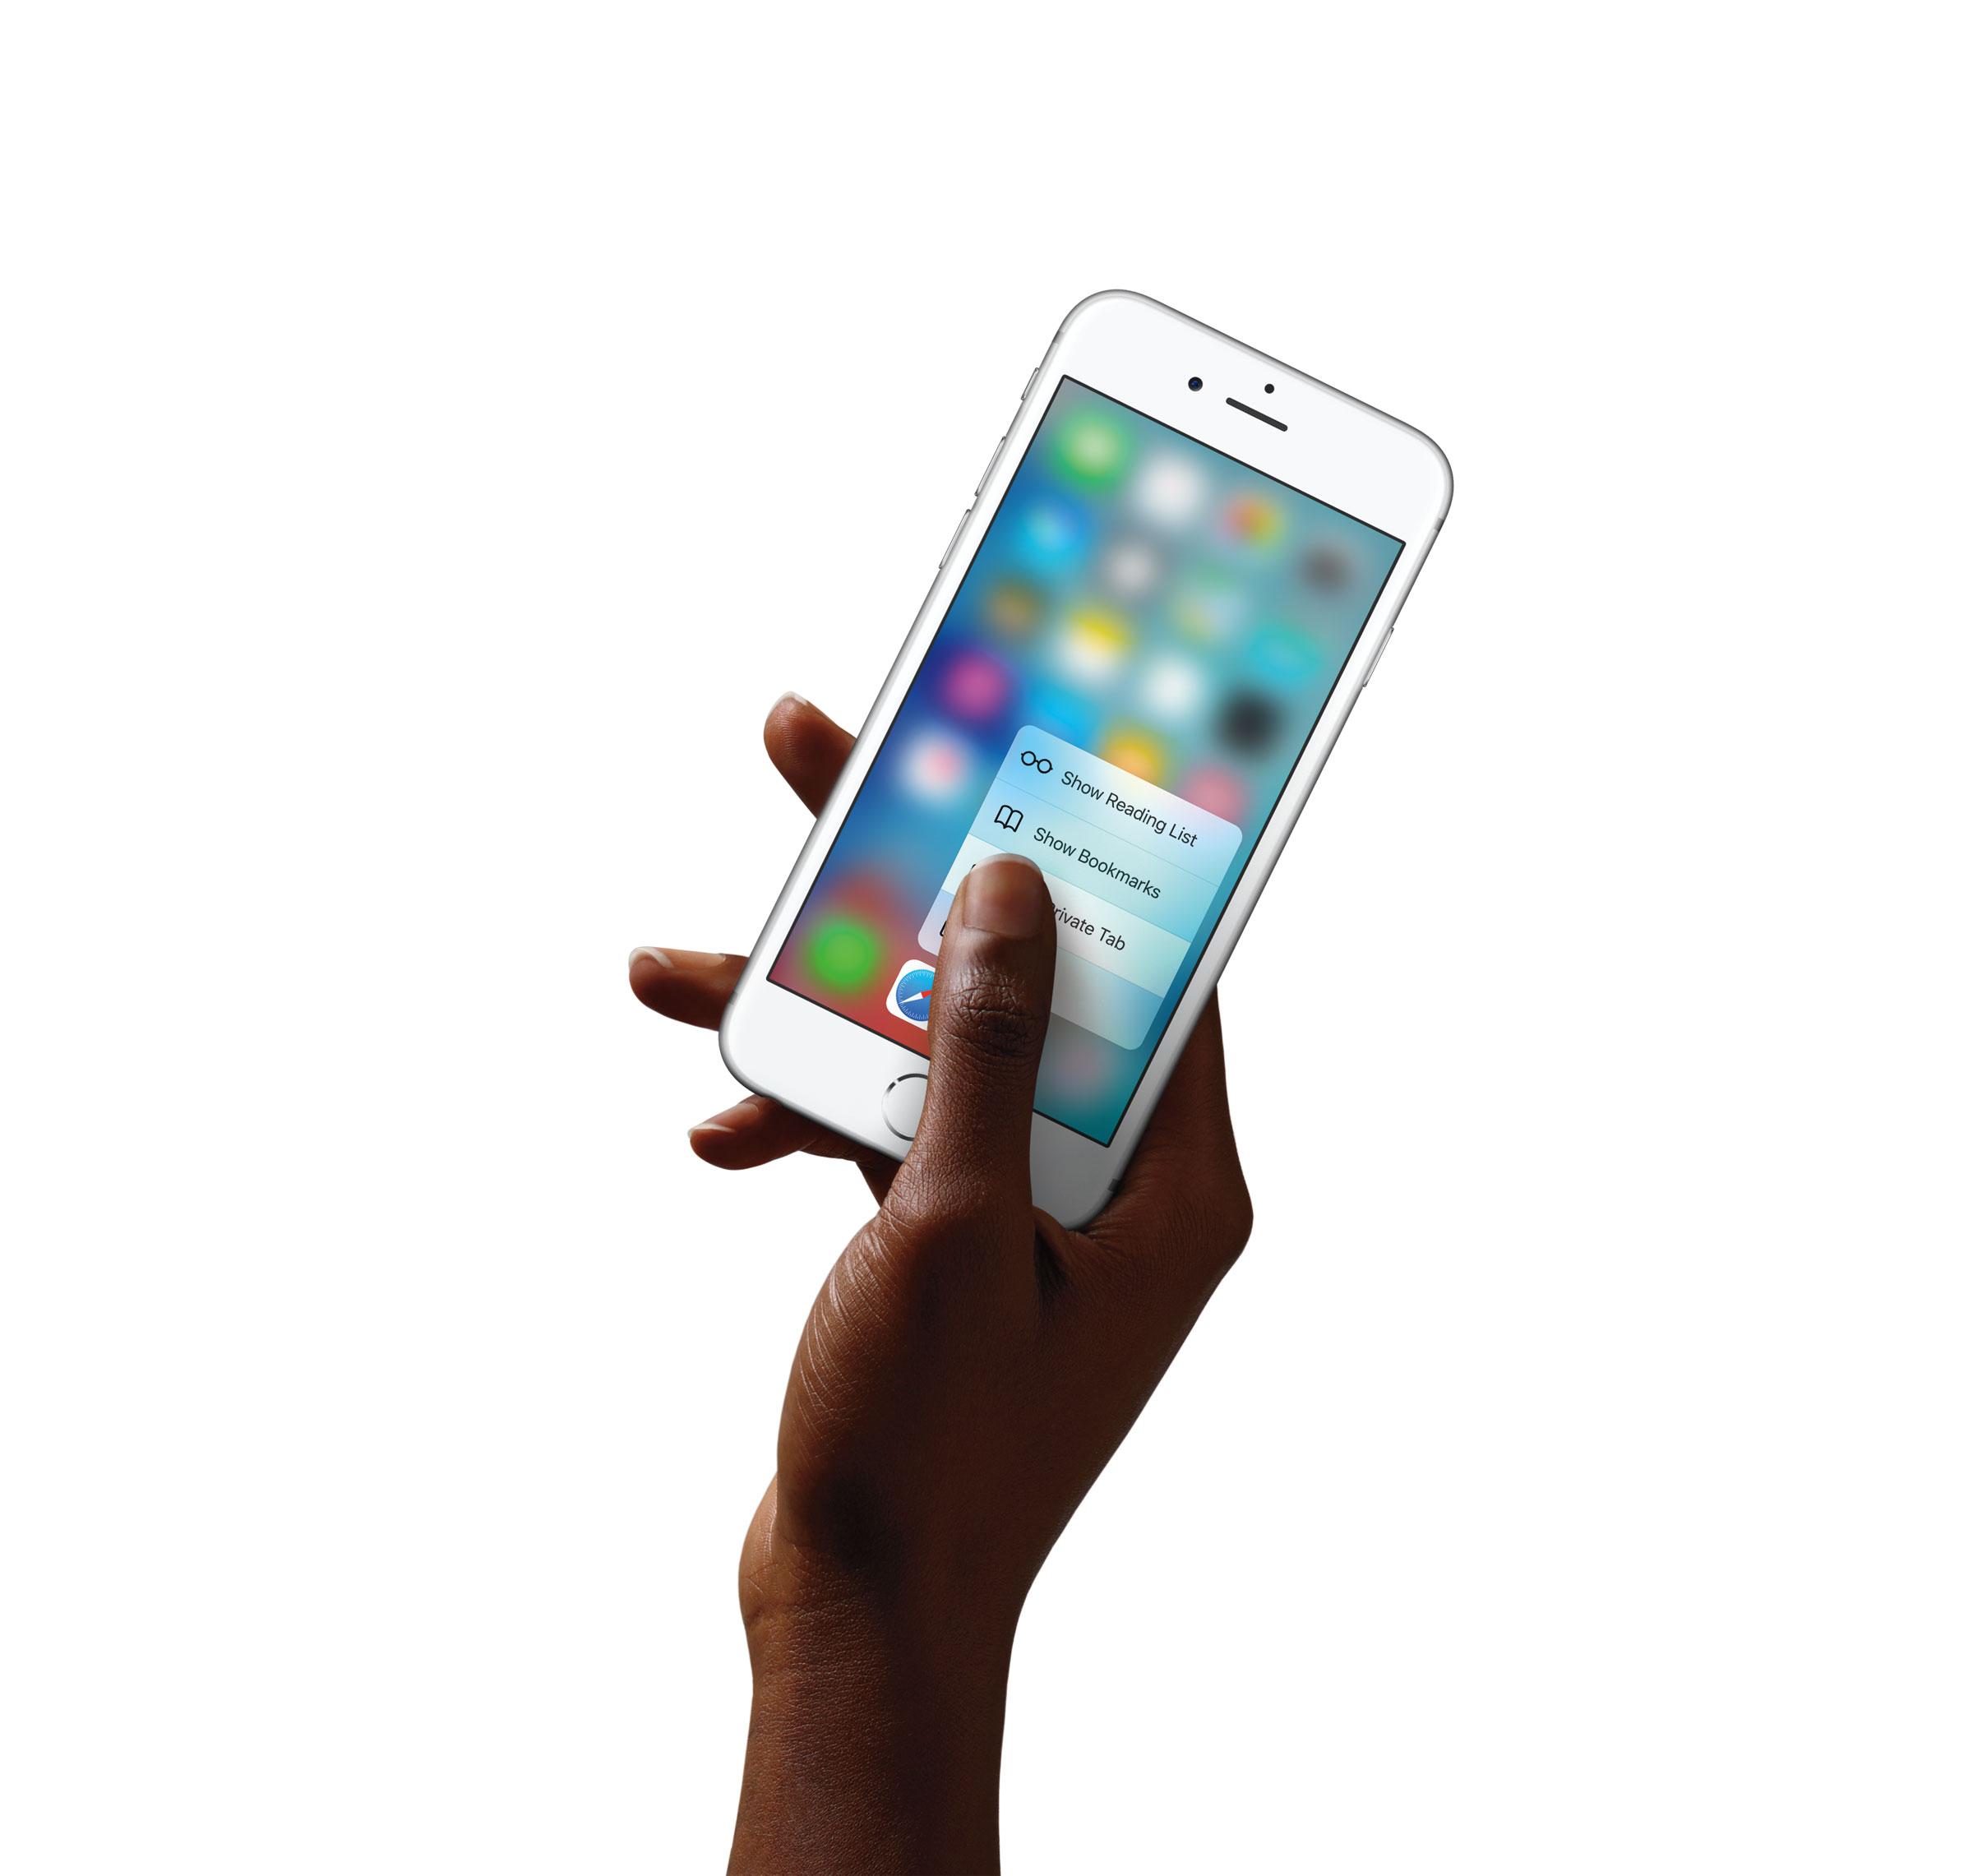 Reachability iPhone 6s